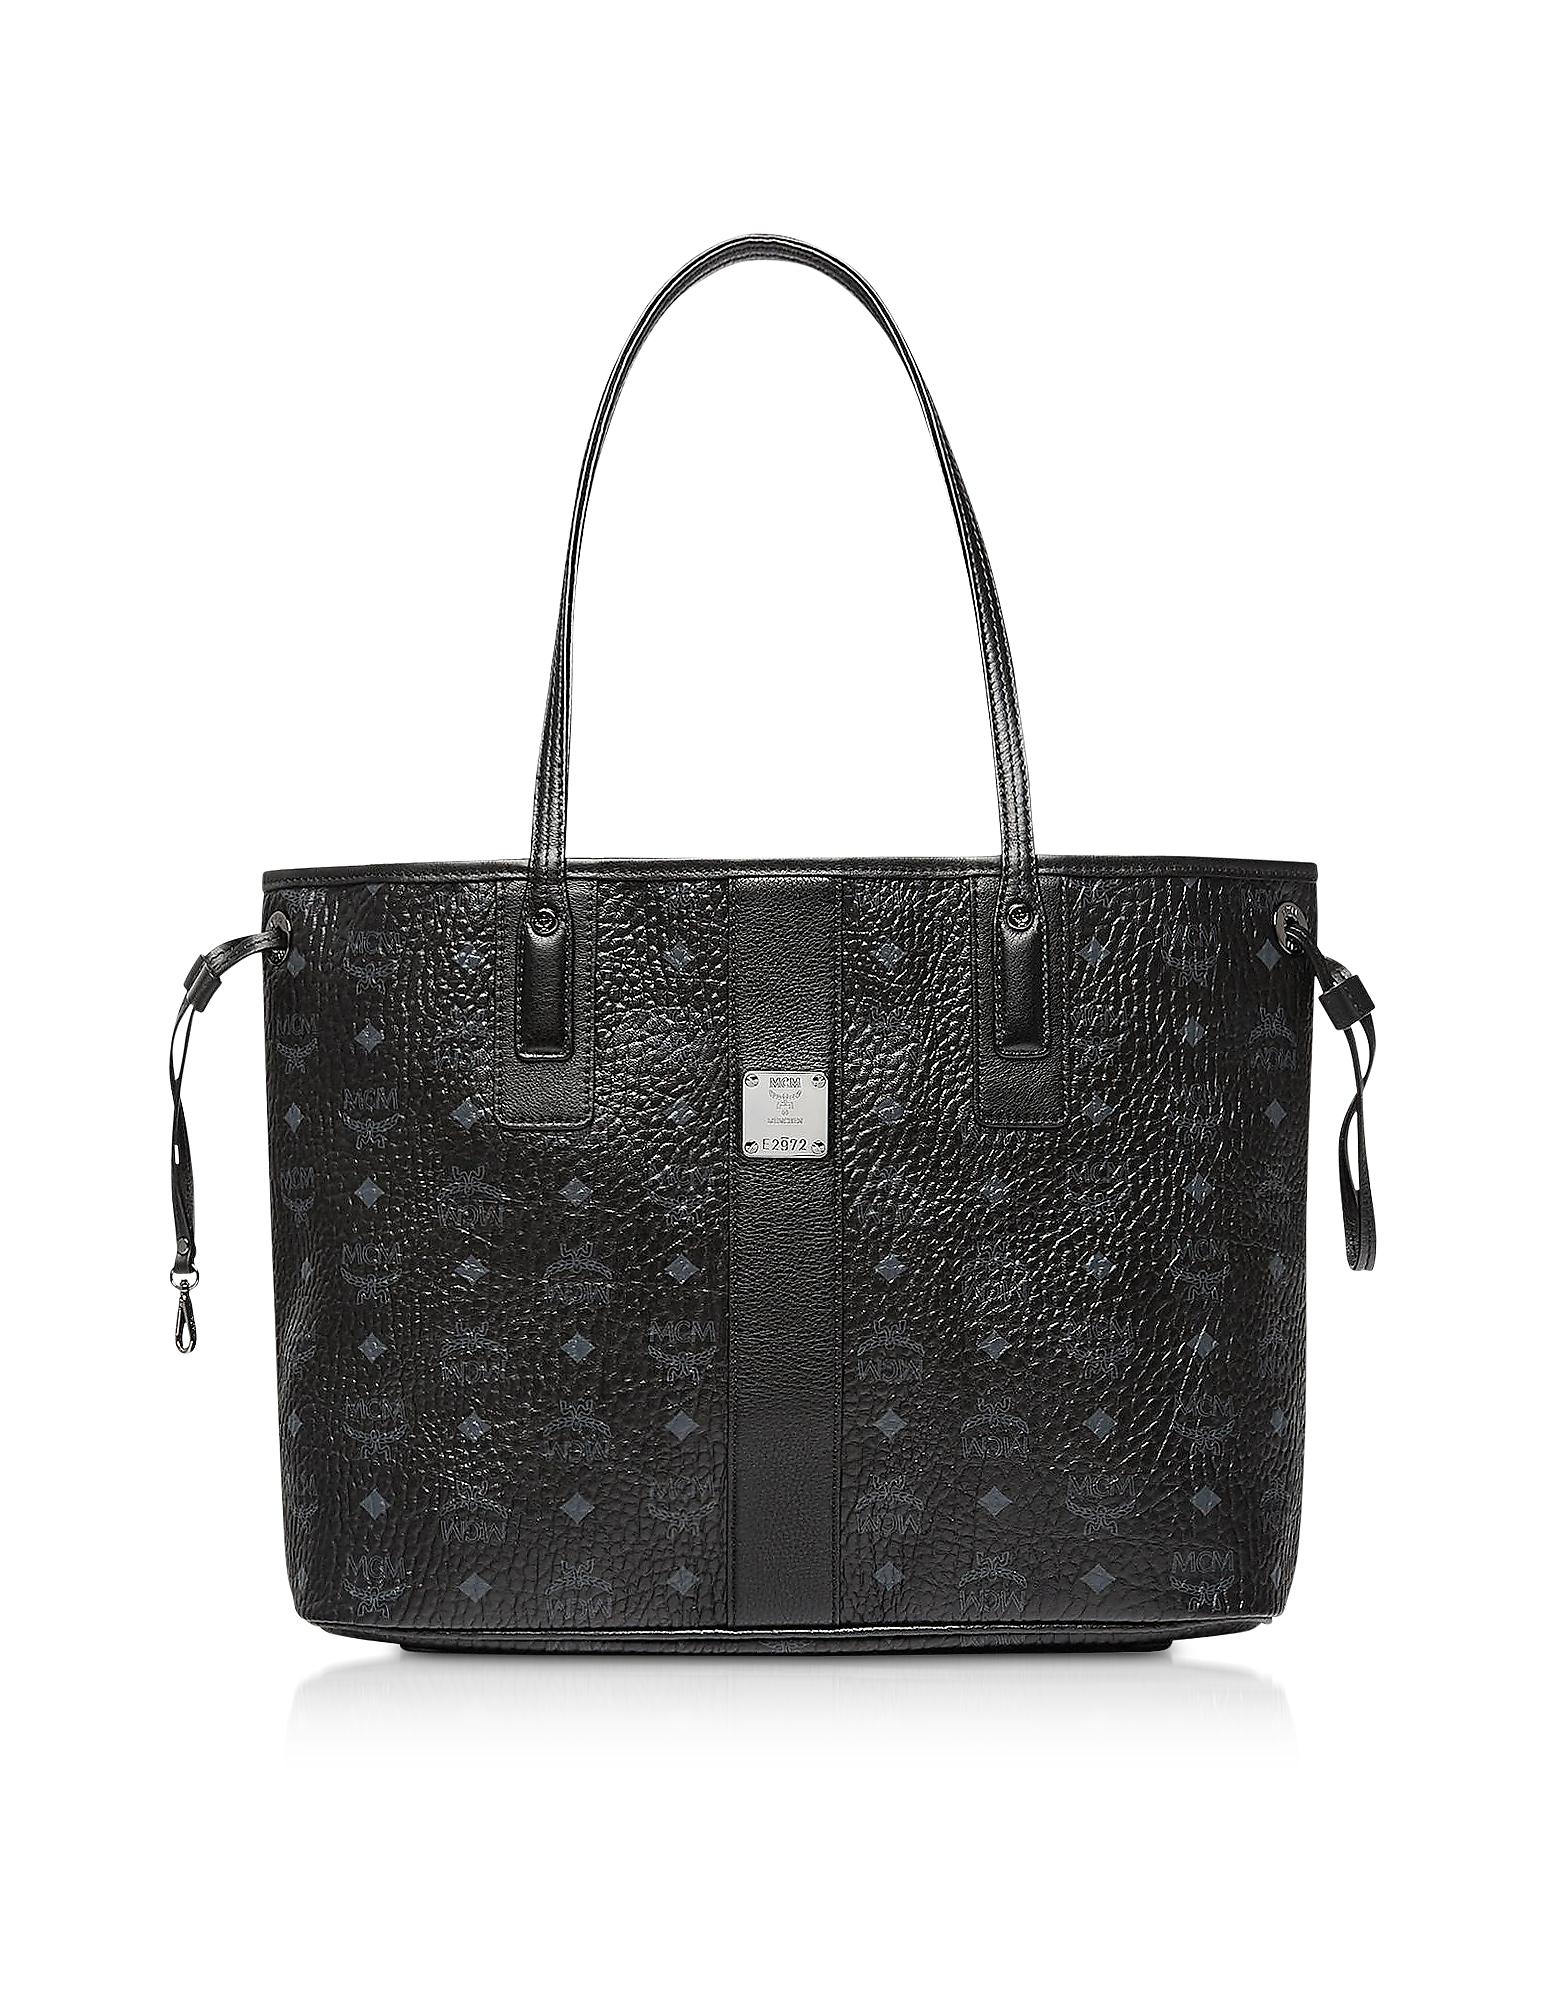 Black Shopper Project Visetos Beige Medium Reversible Tote Bag